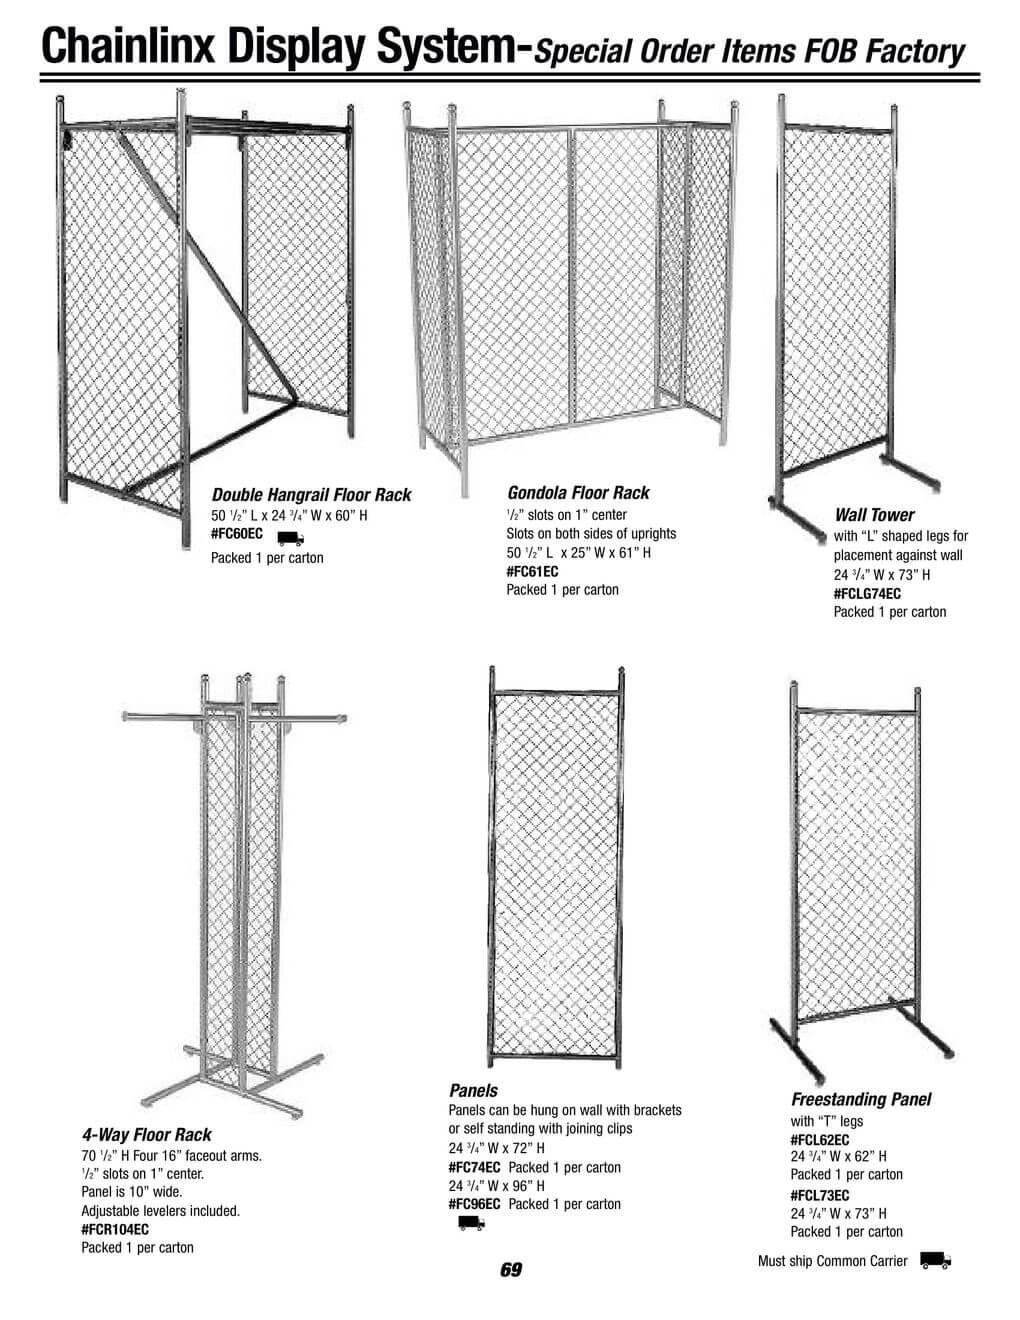 chainlinx display system hangrail, gondola and tower racks